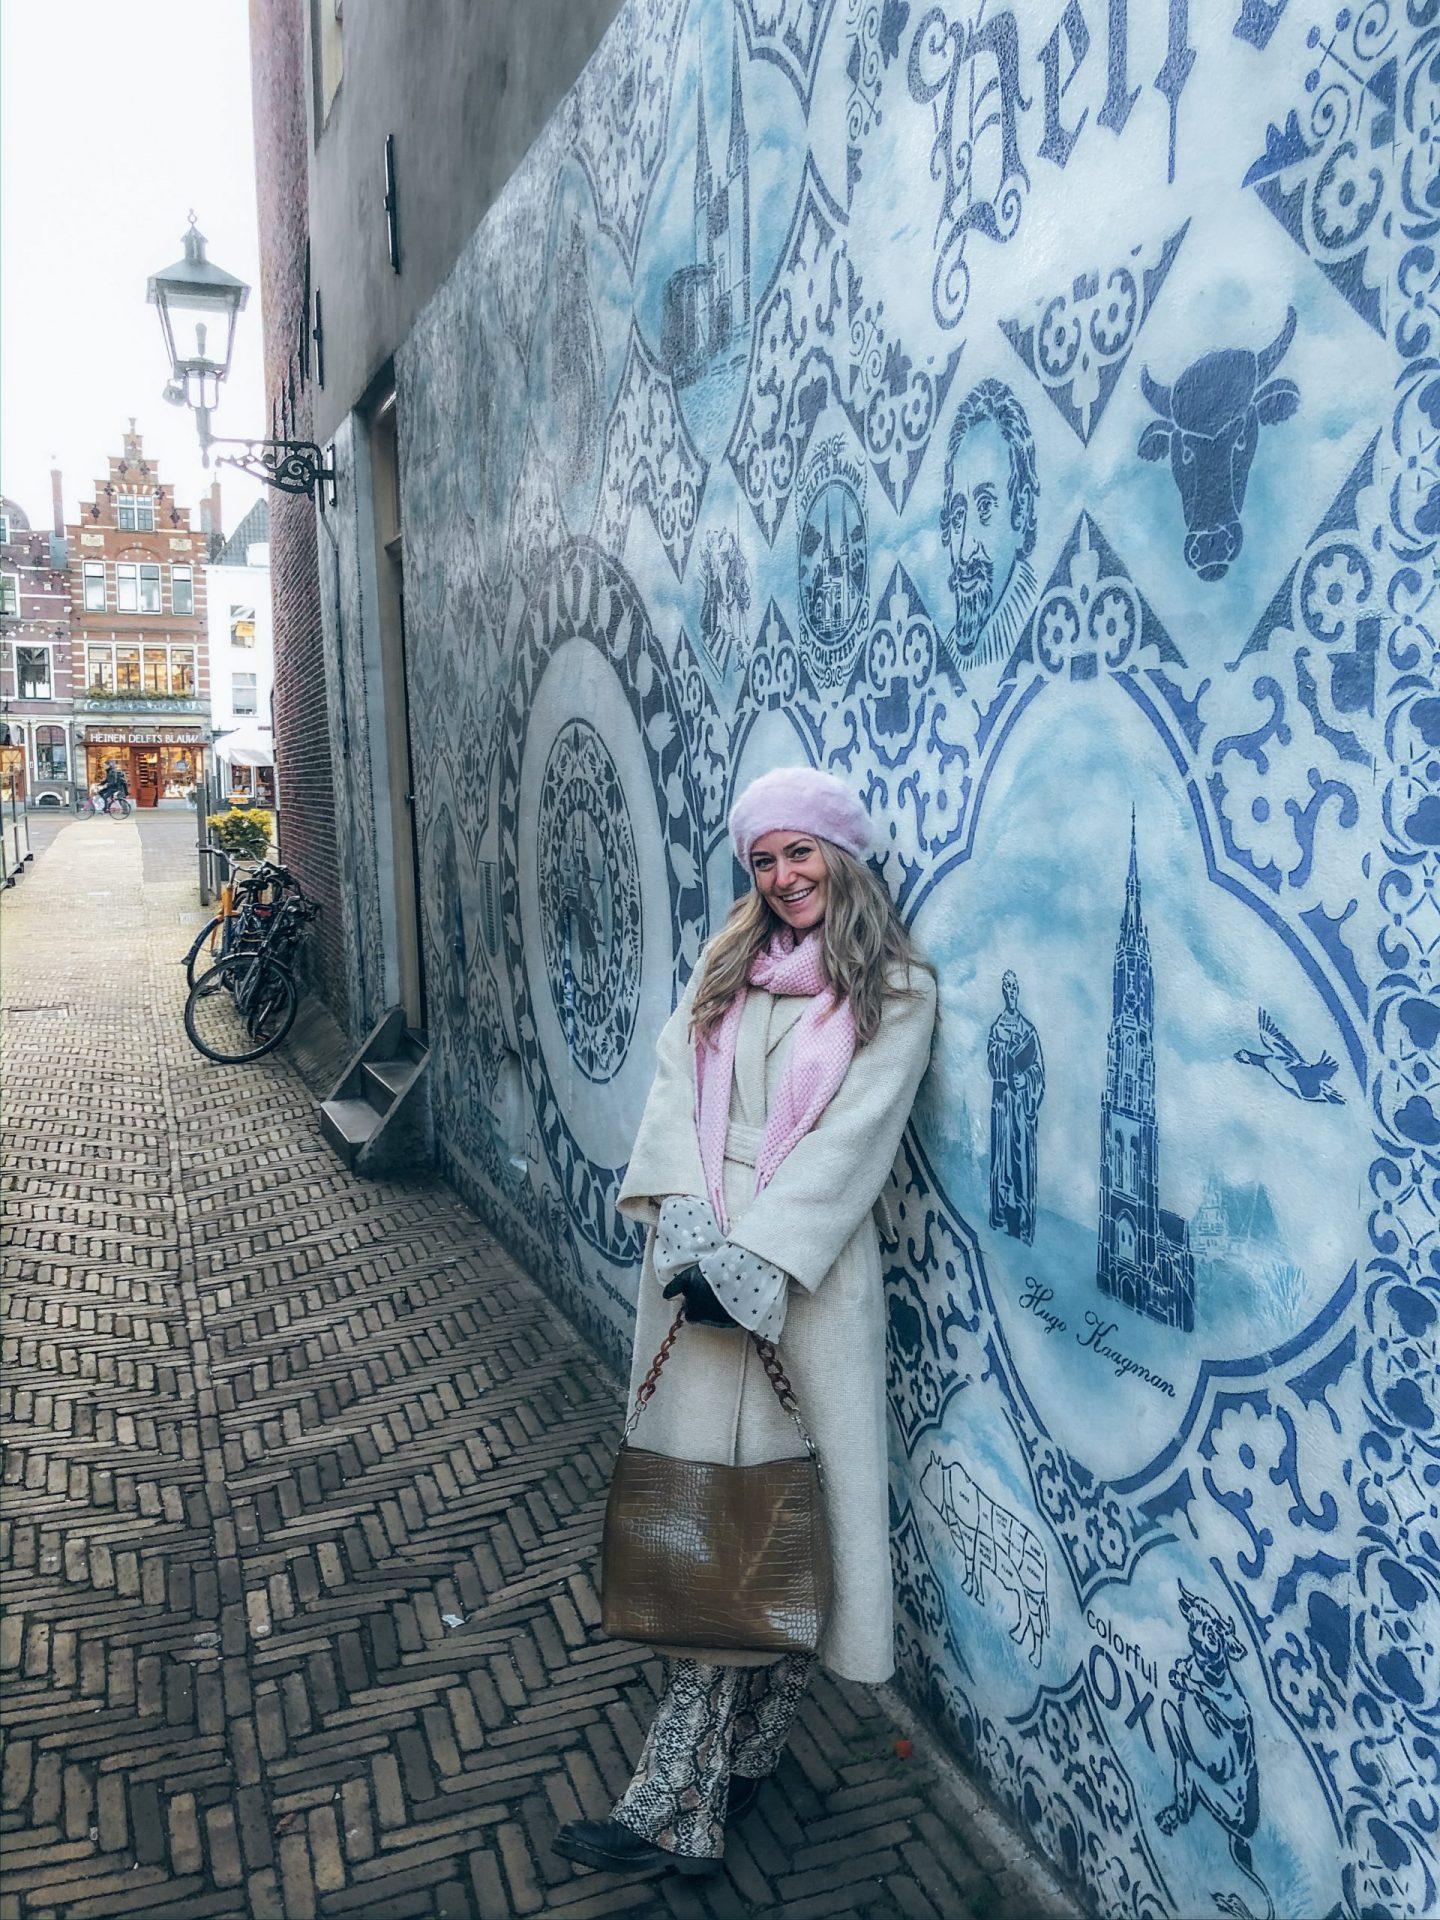 Delft, weekendje weg, weekend, vakantie, hotel, hotels, hotels.nl, casa julie, hotel juliana, xmariekie, reisblogger